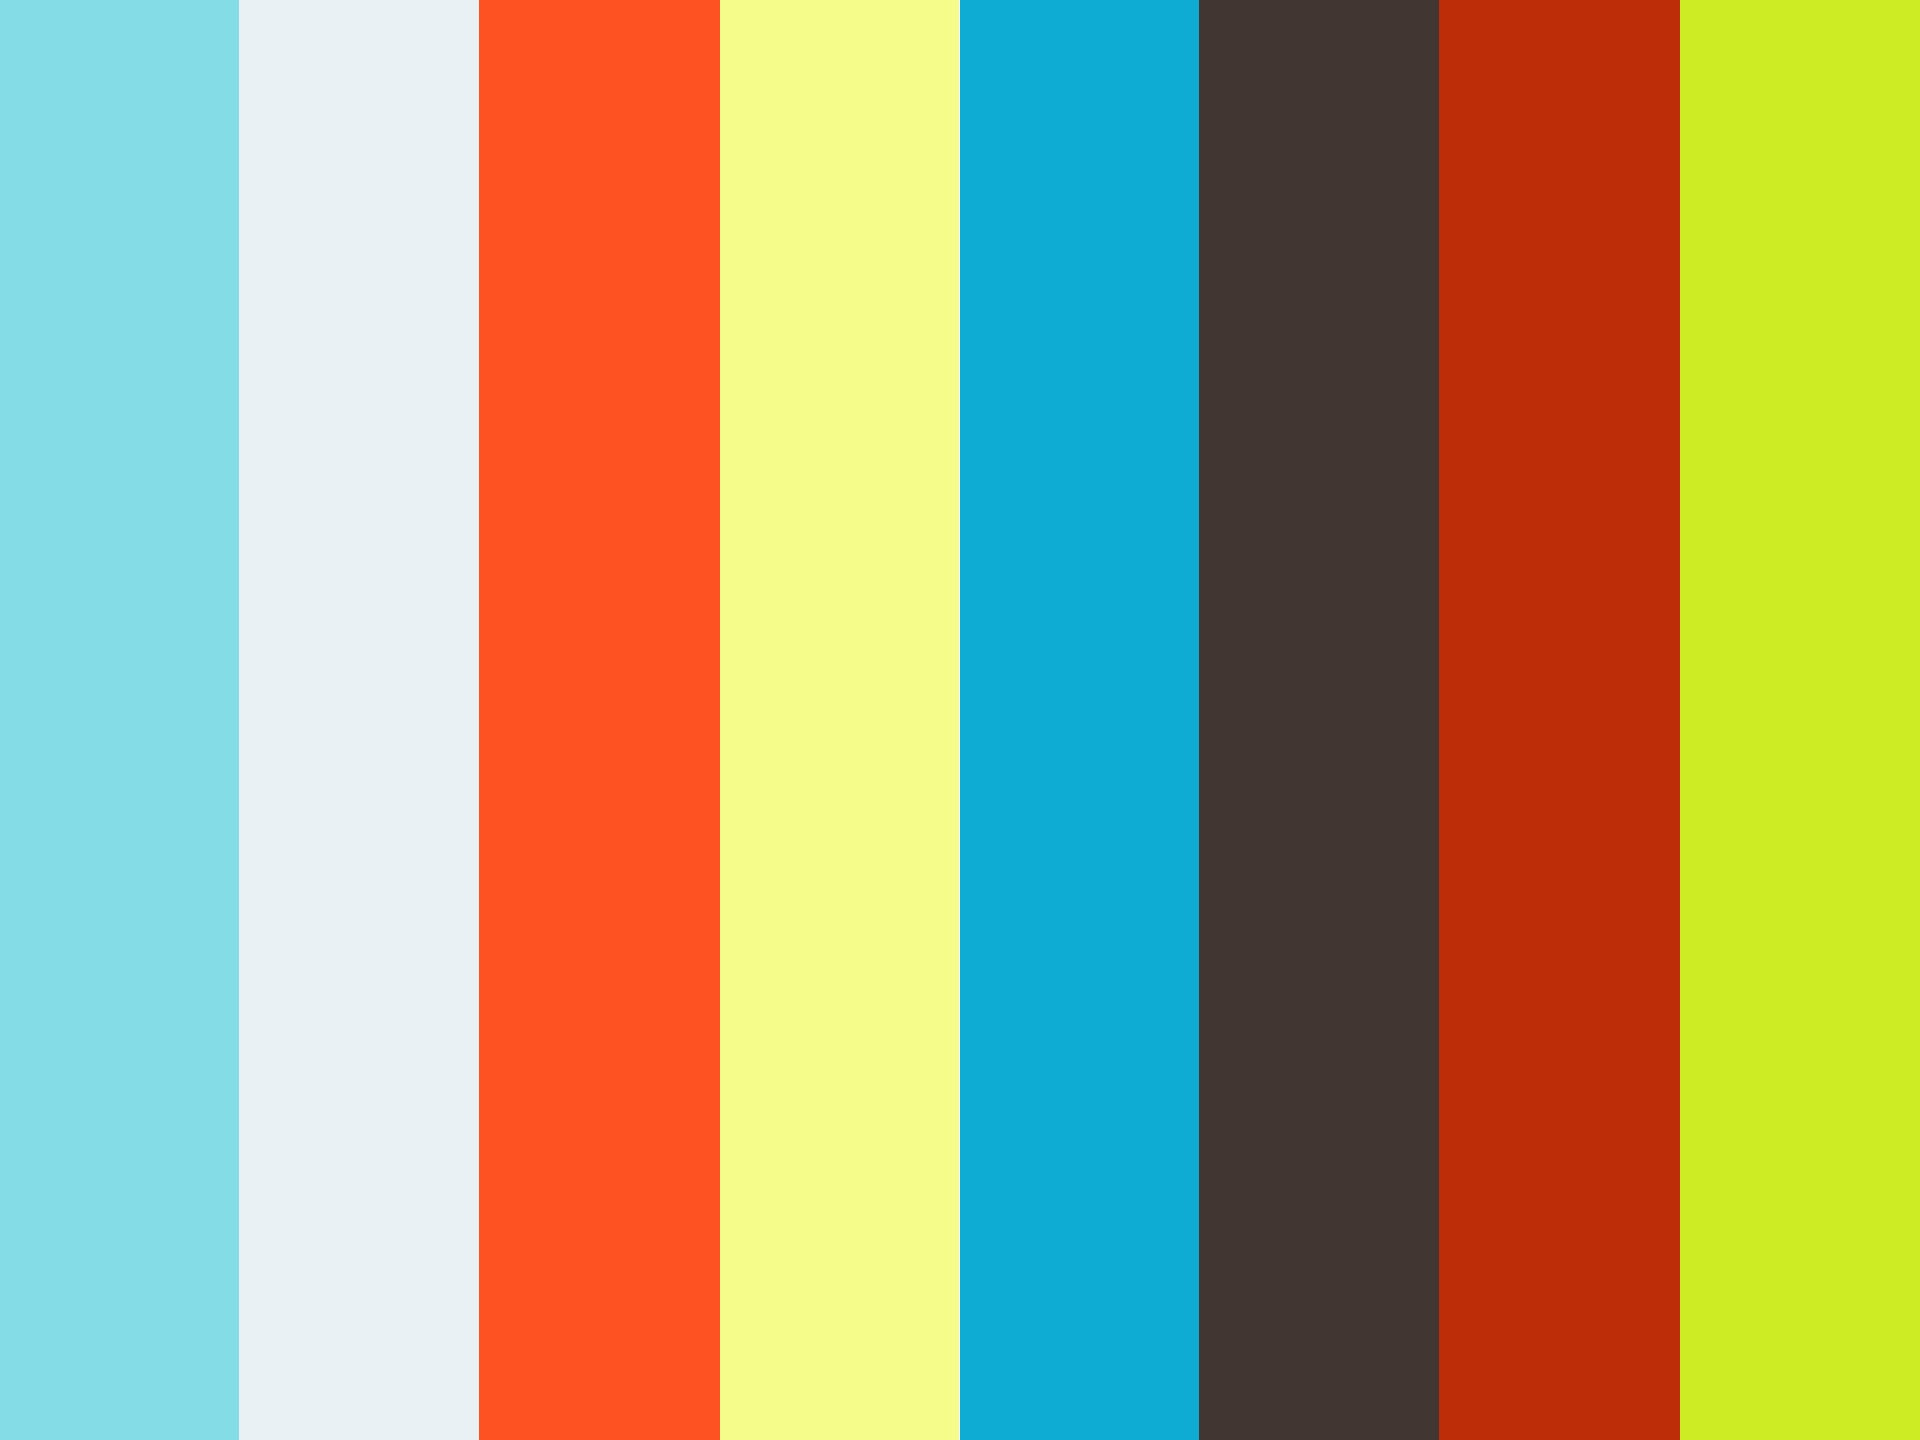 MERCEDES BENZ C180 - GREY - 2017